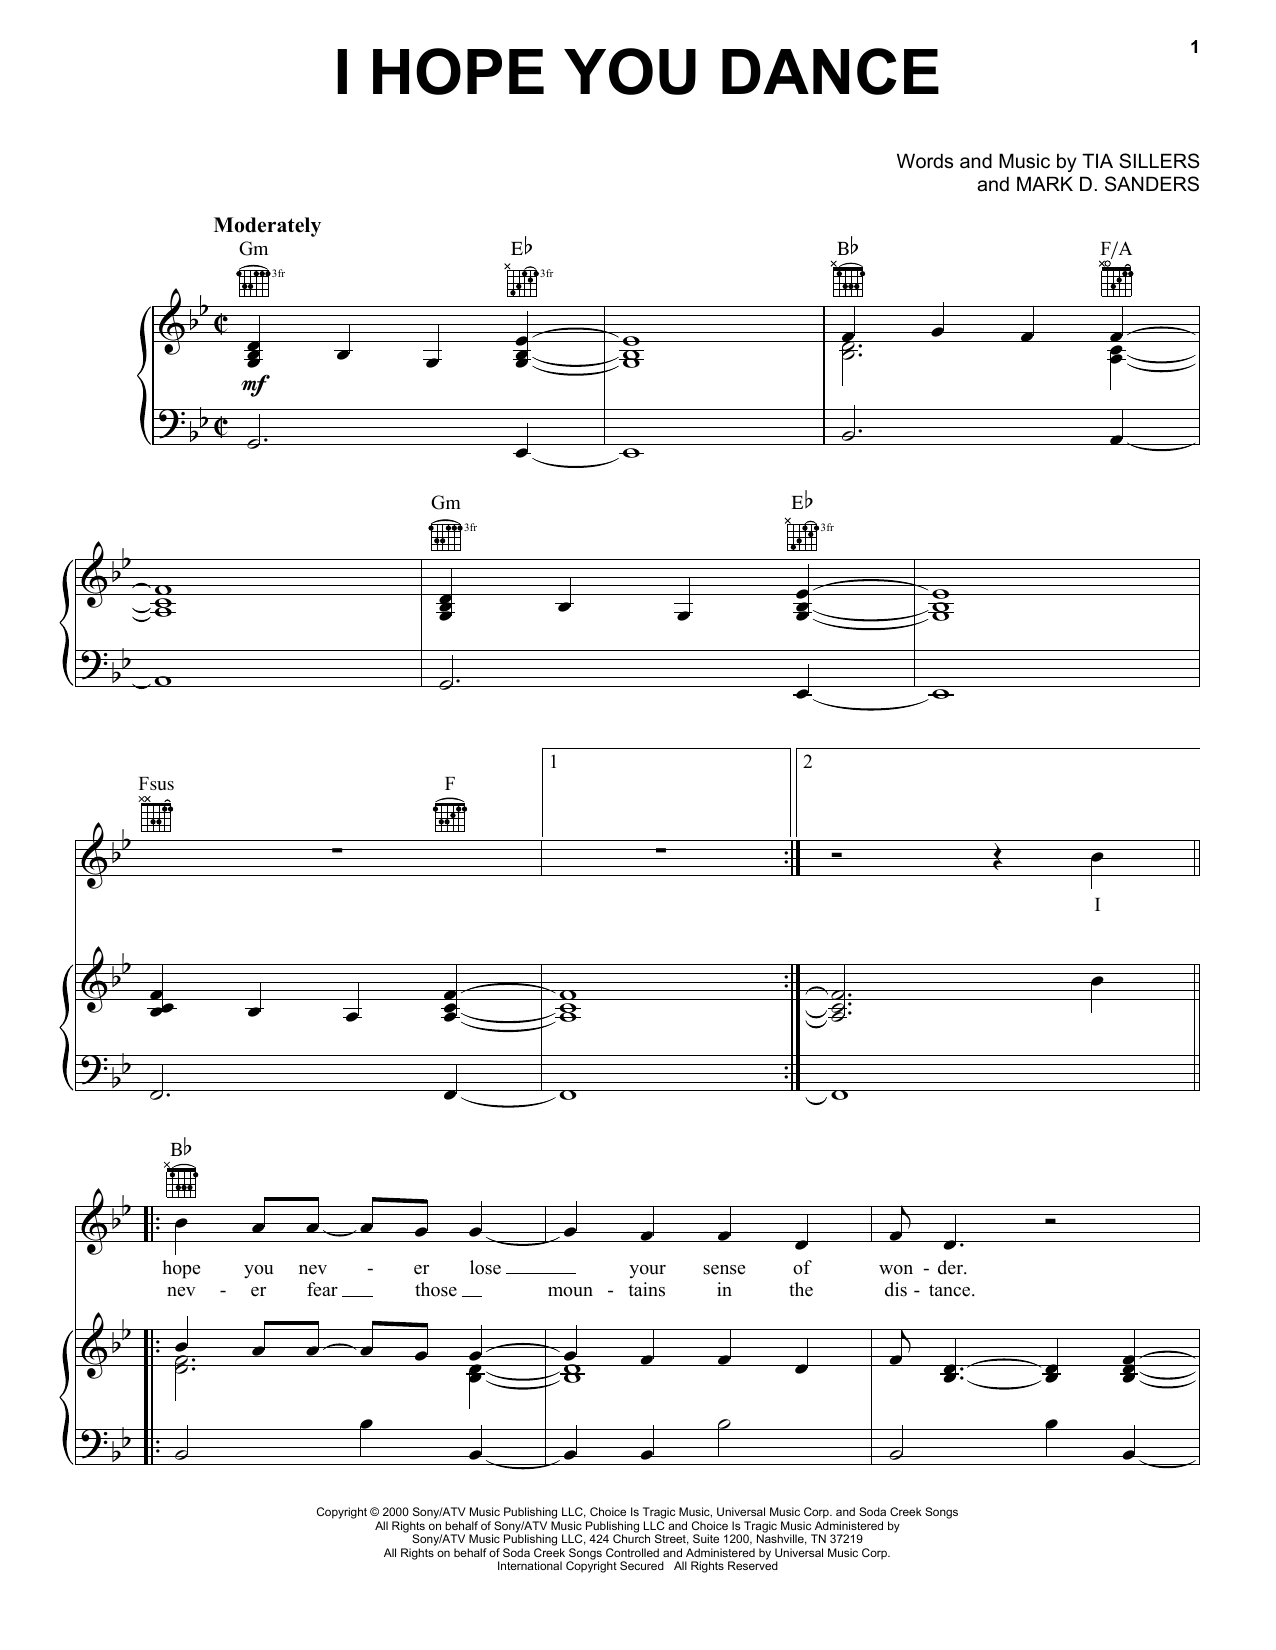 Ronan Keating I Hope You Dance Sheet Music Notes, Chords   Download  Printable Piano, Vocal & Guitar Right Hand Melody PDF Score   SKU 15